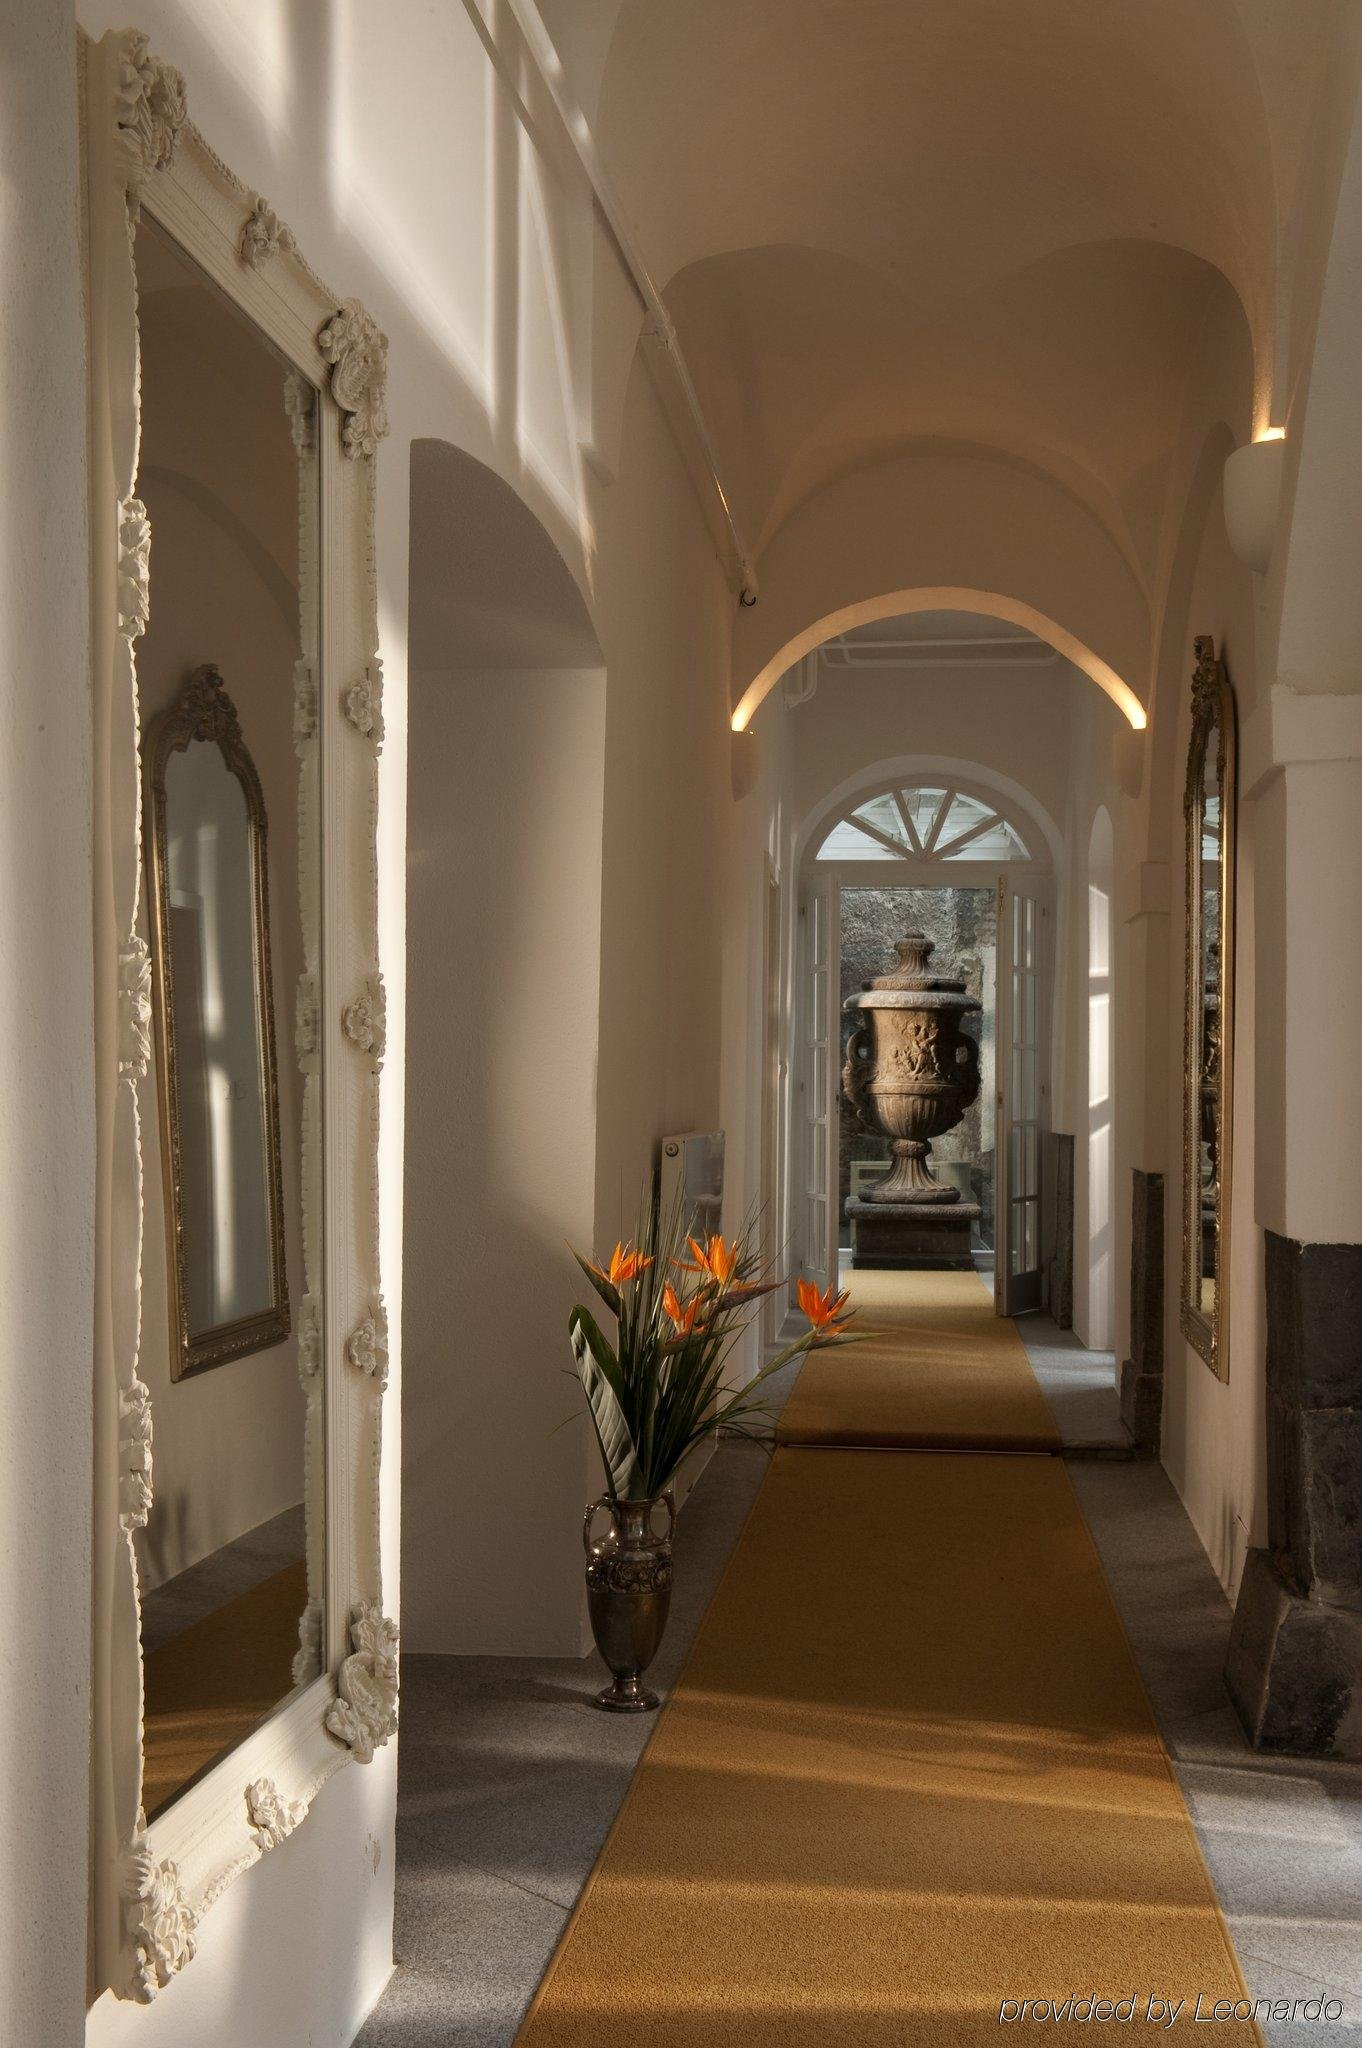 ANTIQ PALACE - Slovenia - Ljubljana